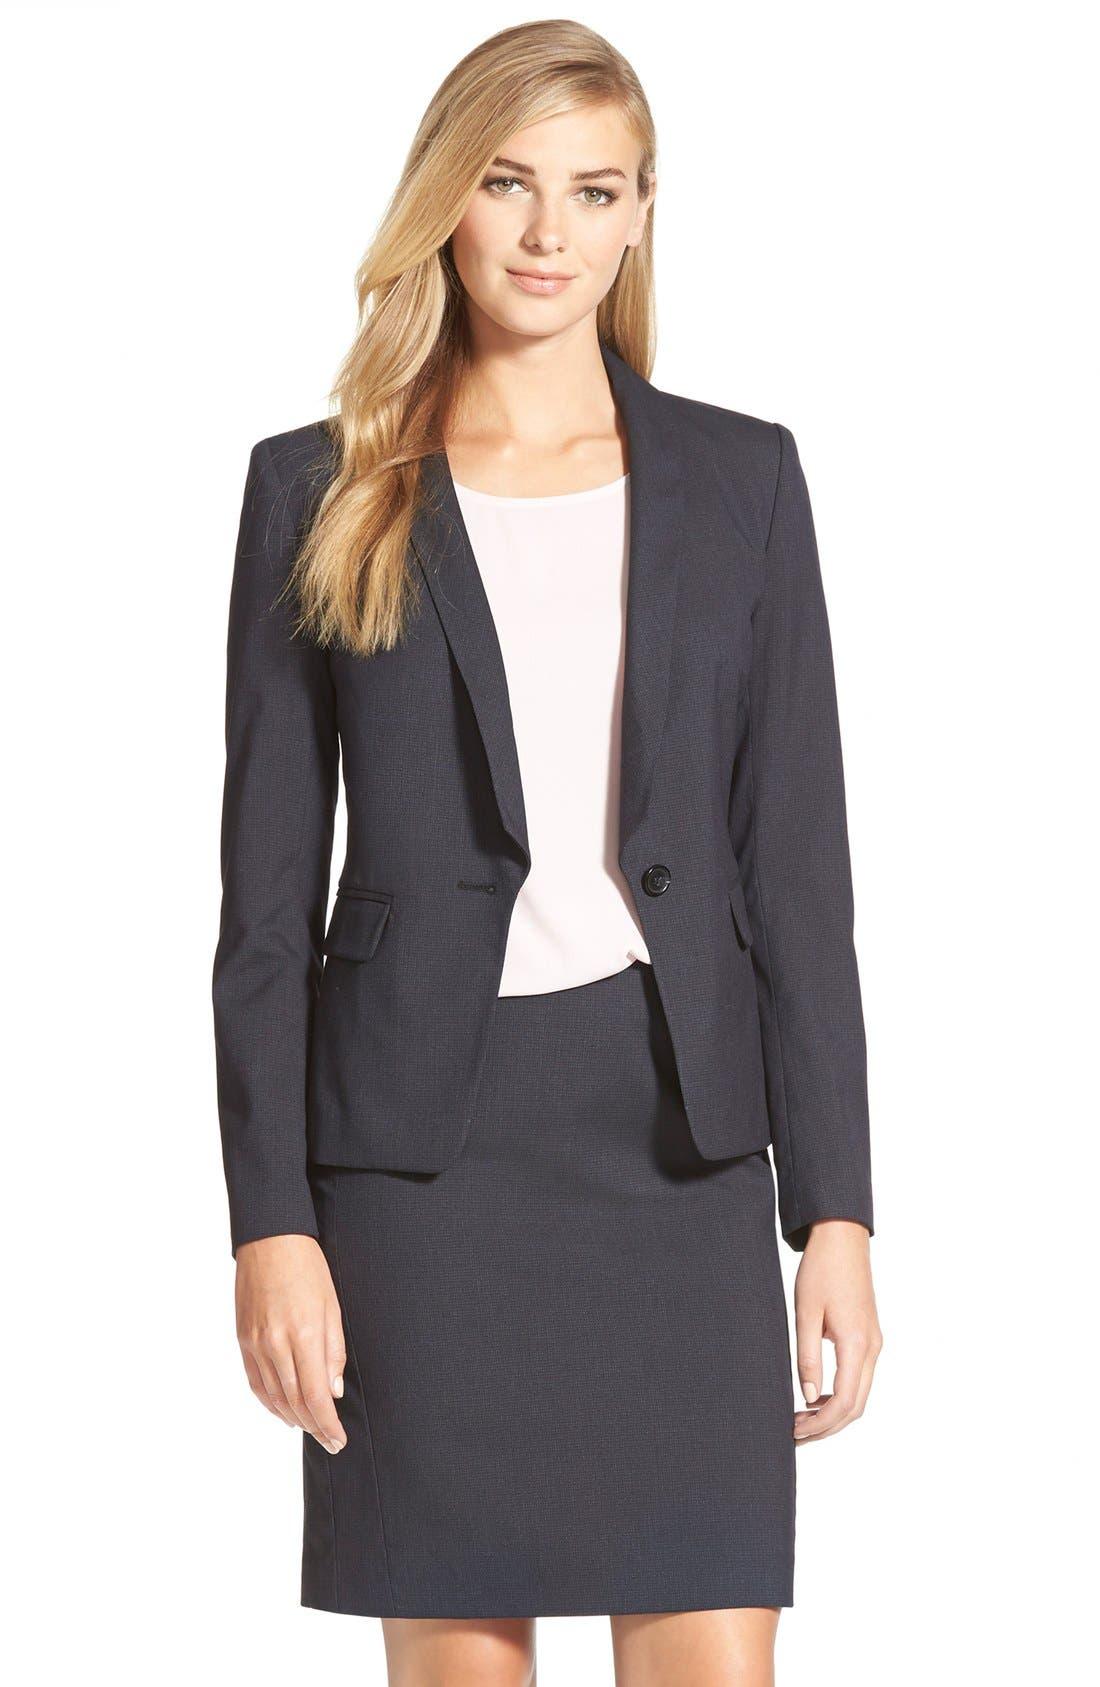 Alternate Image 1 Selected - Halogen® Crosshatch Suit Jacket (Regular & Petite)